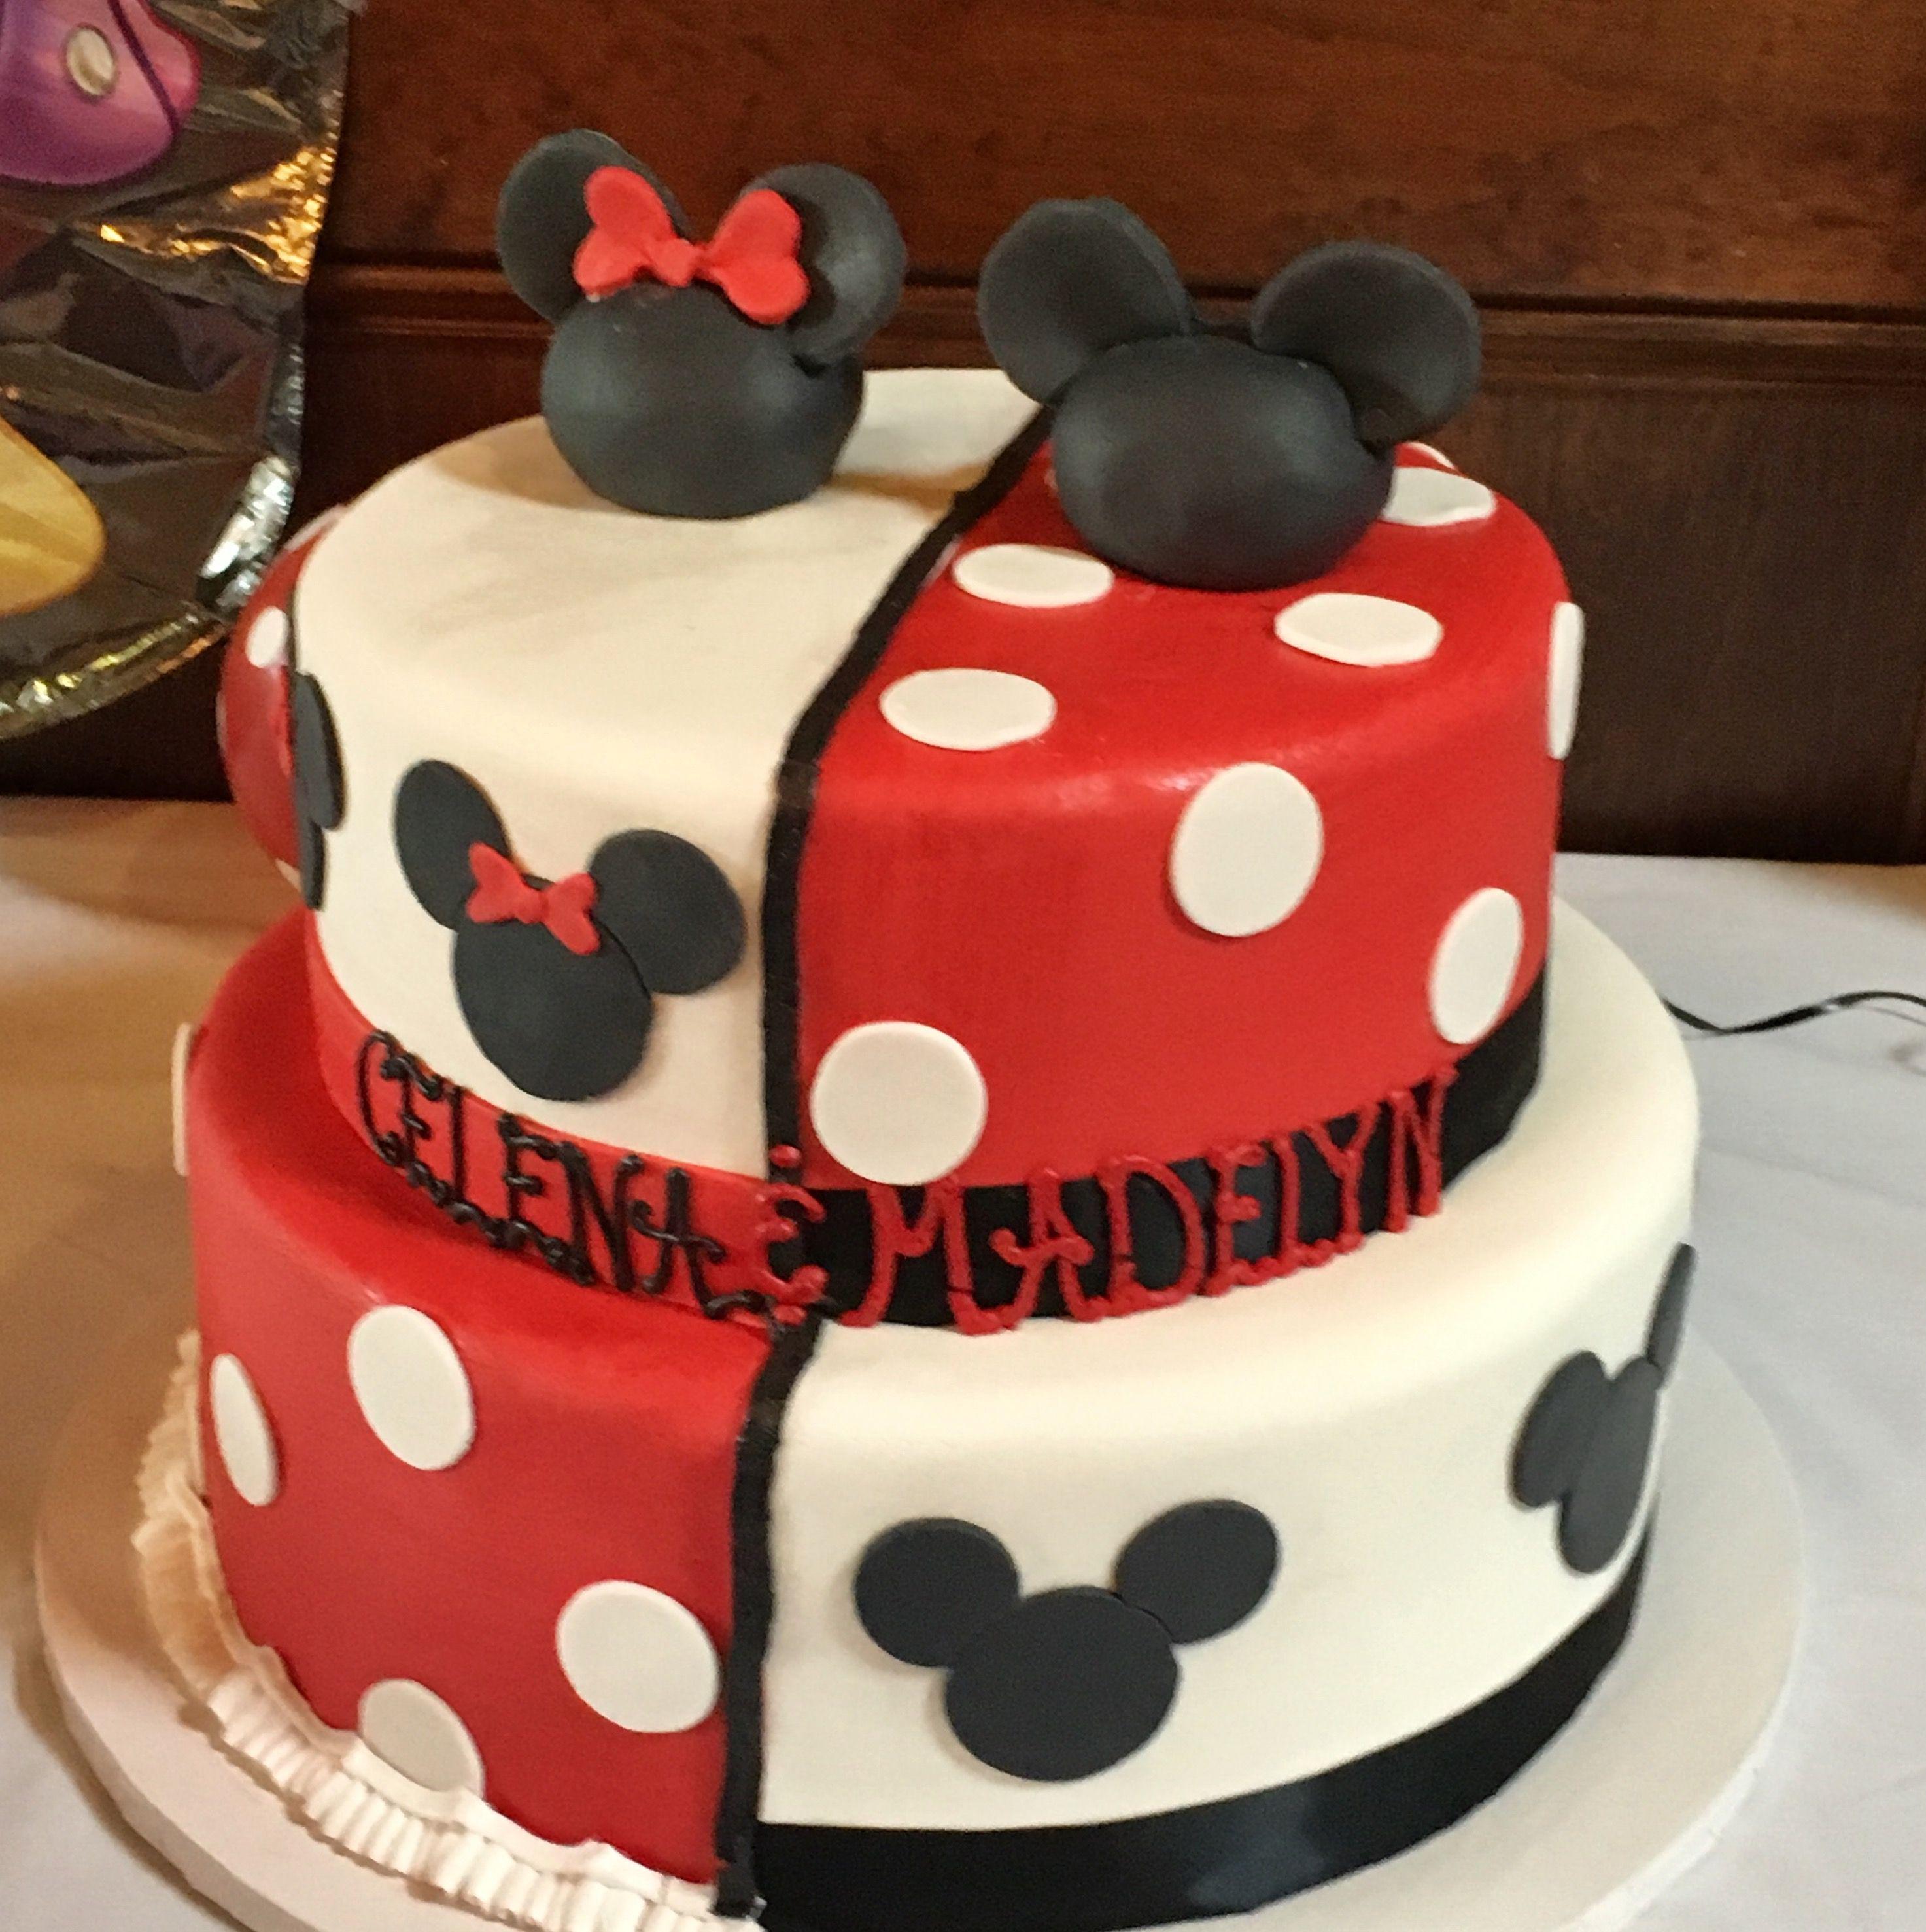 Split Mickey Minnie Cake For My Twins Oh Two Dles Birthday Minnie Mouse Birthday Cakes Twin Birthday Cakes Minnie Birthday Party